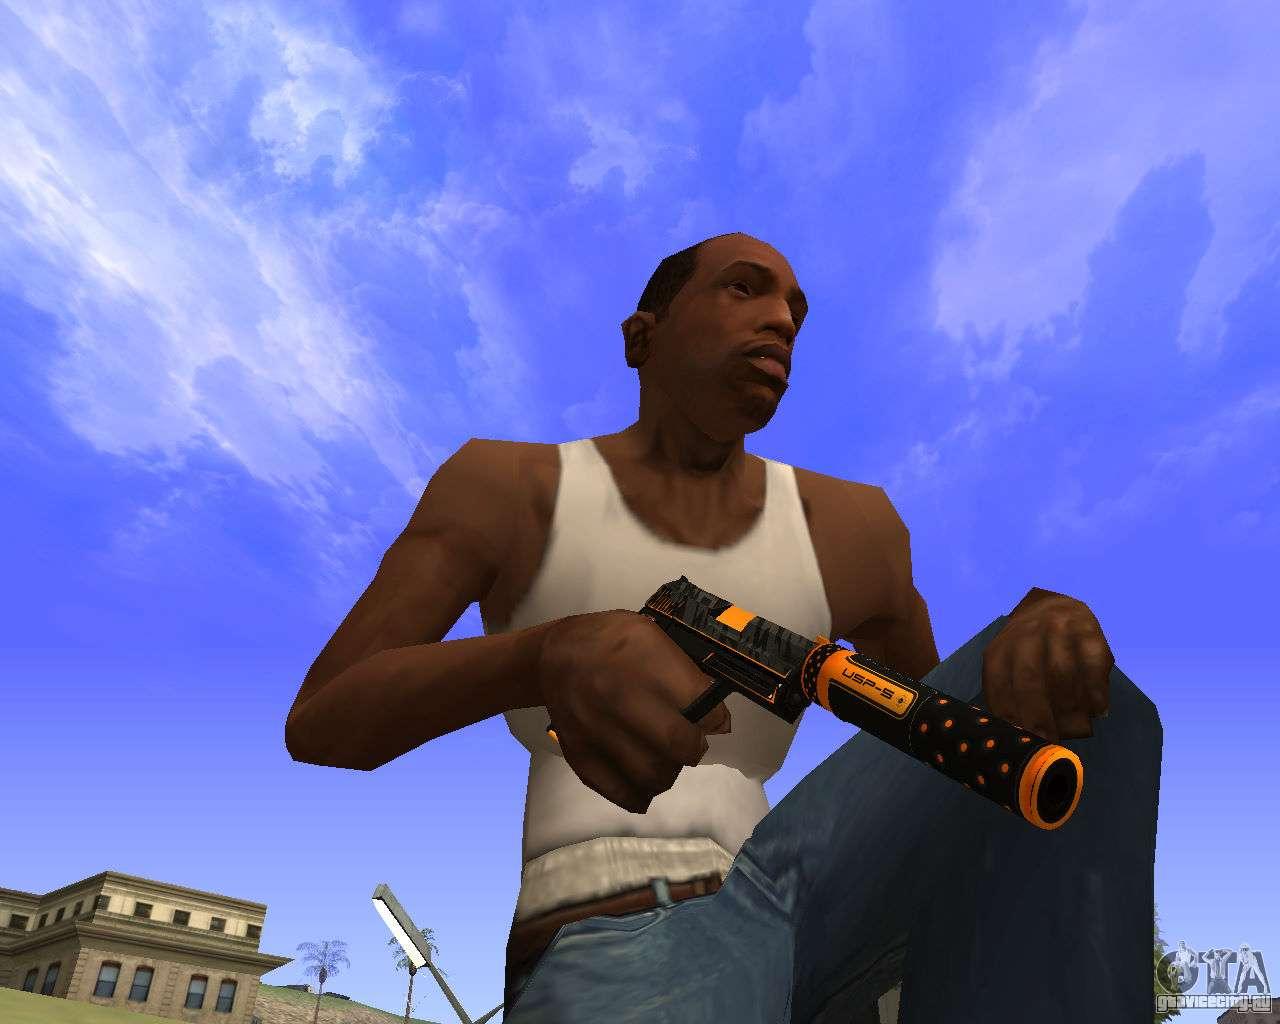 Grand theft auto 5 cs go skins weapon pack cs go trade онлайн проверка